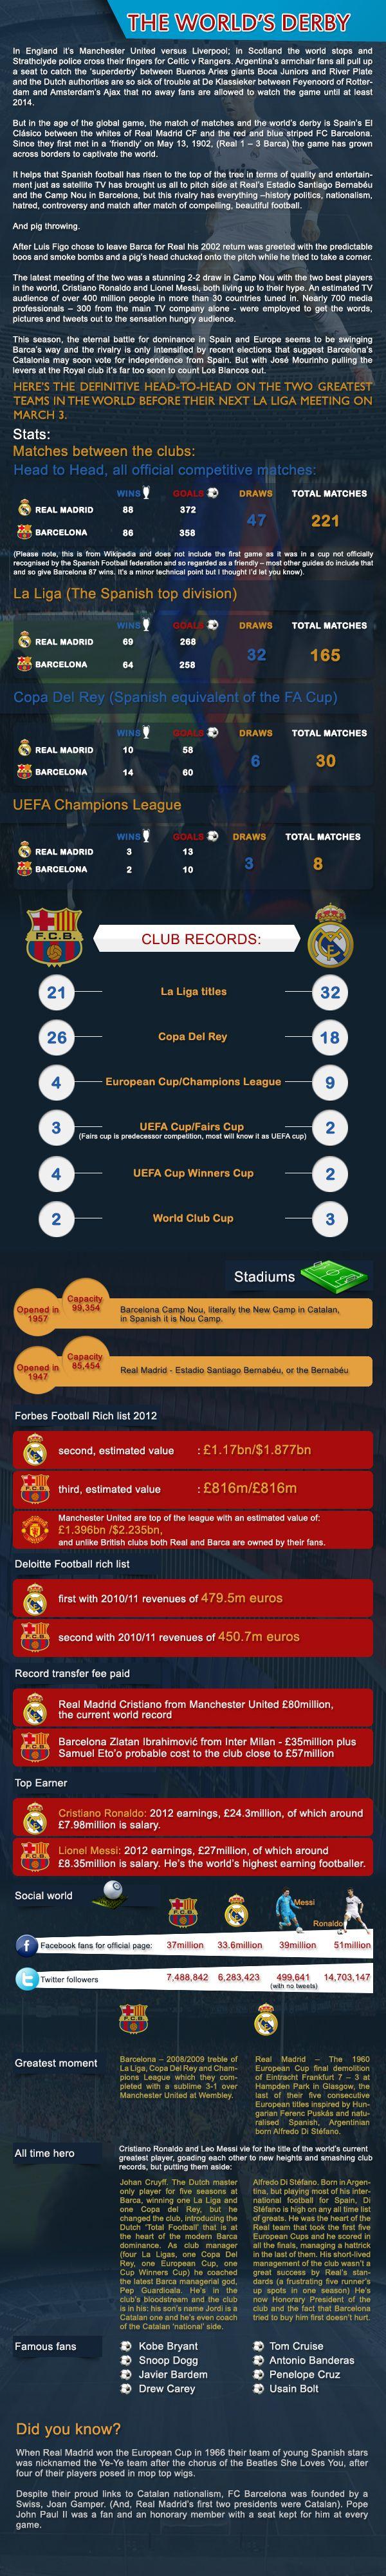 Show me some soccer love • Barcelona vs Real Madrid #infographic